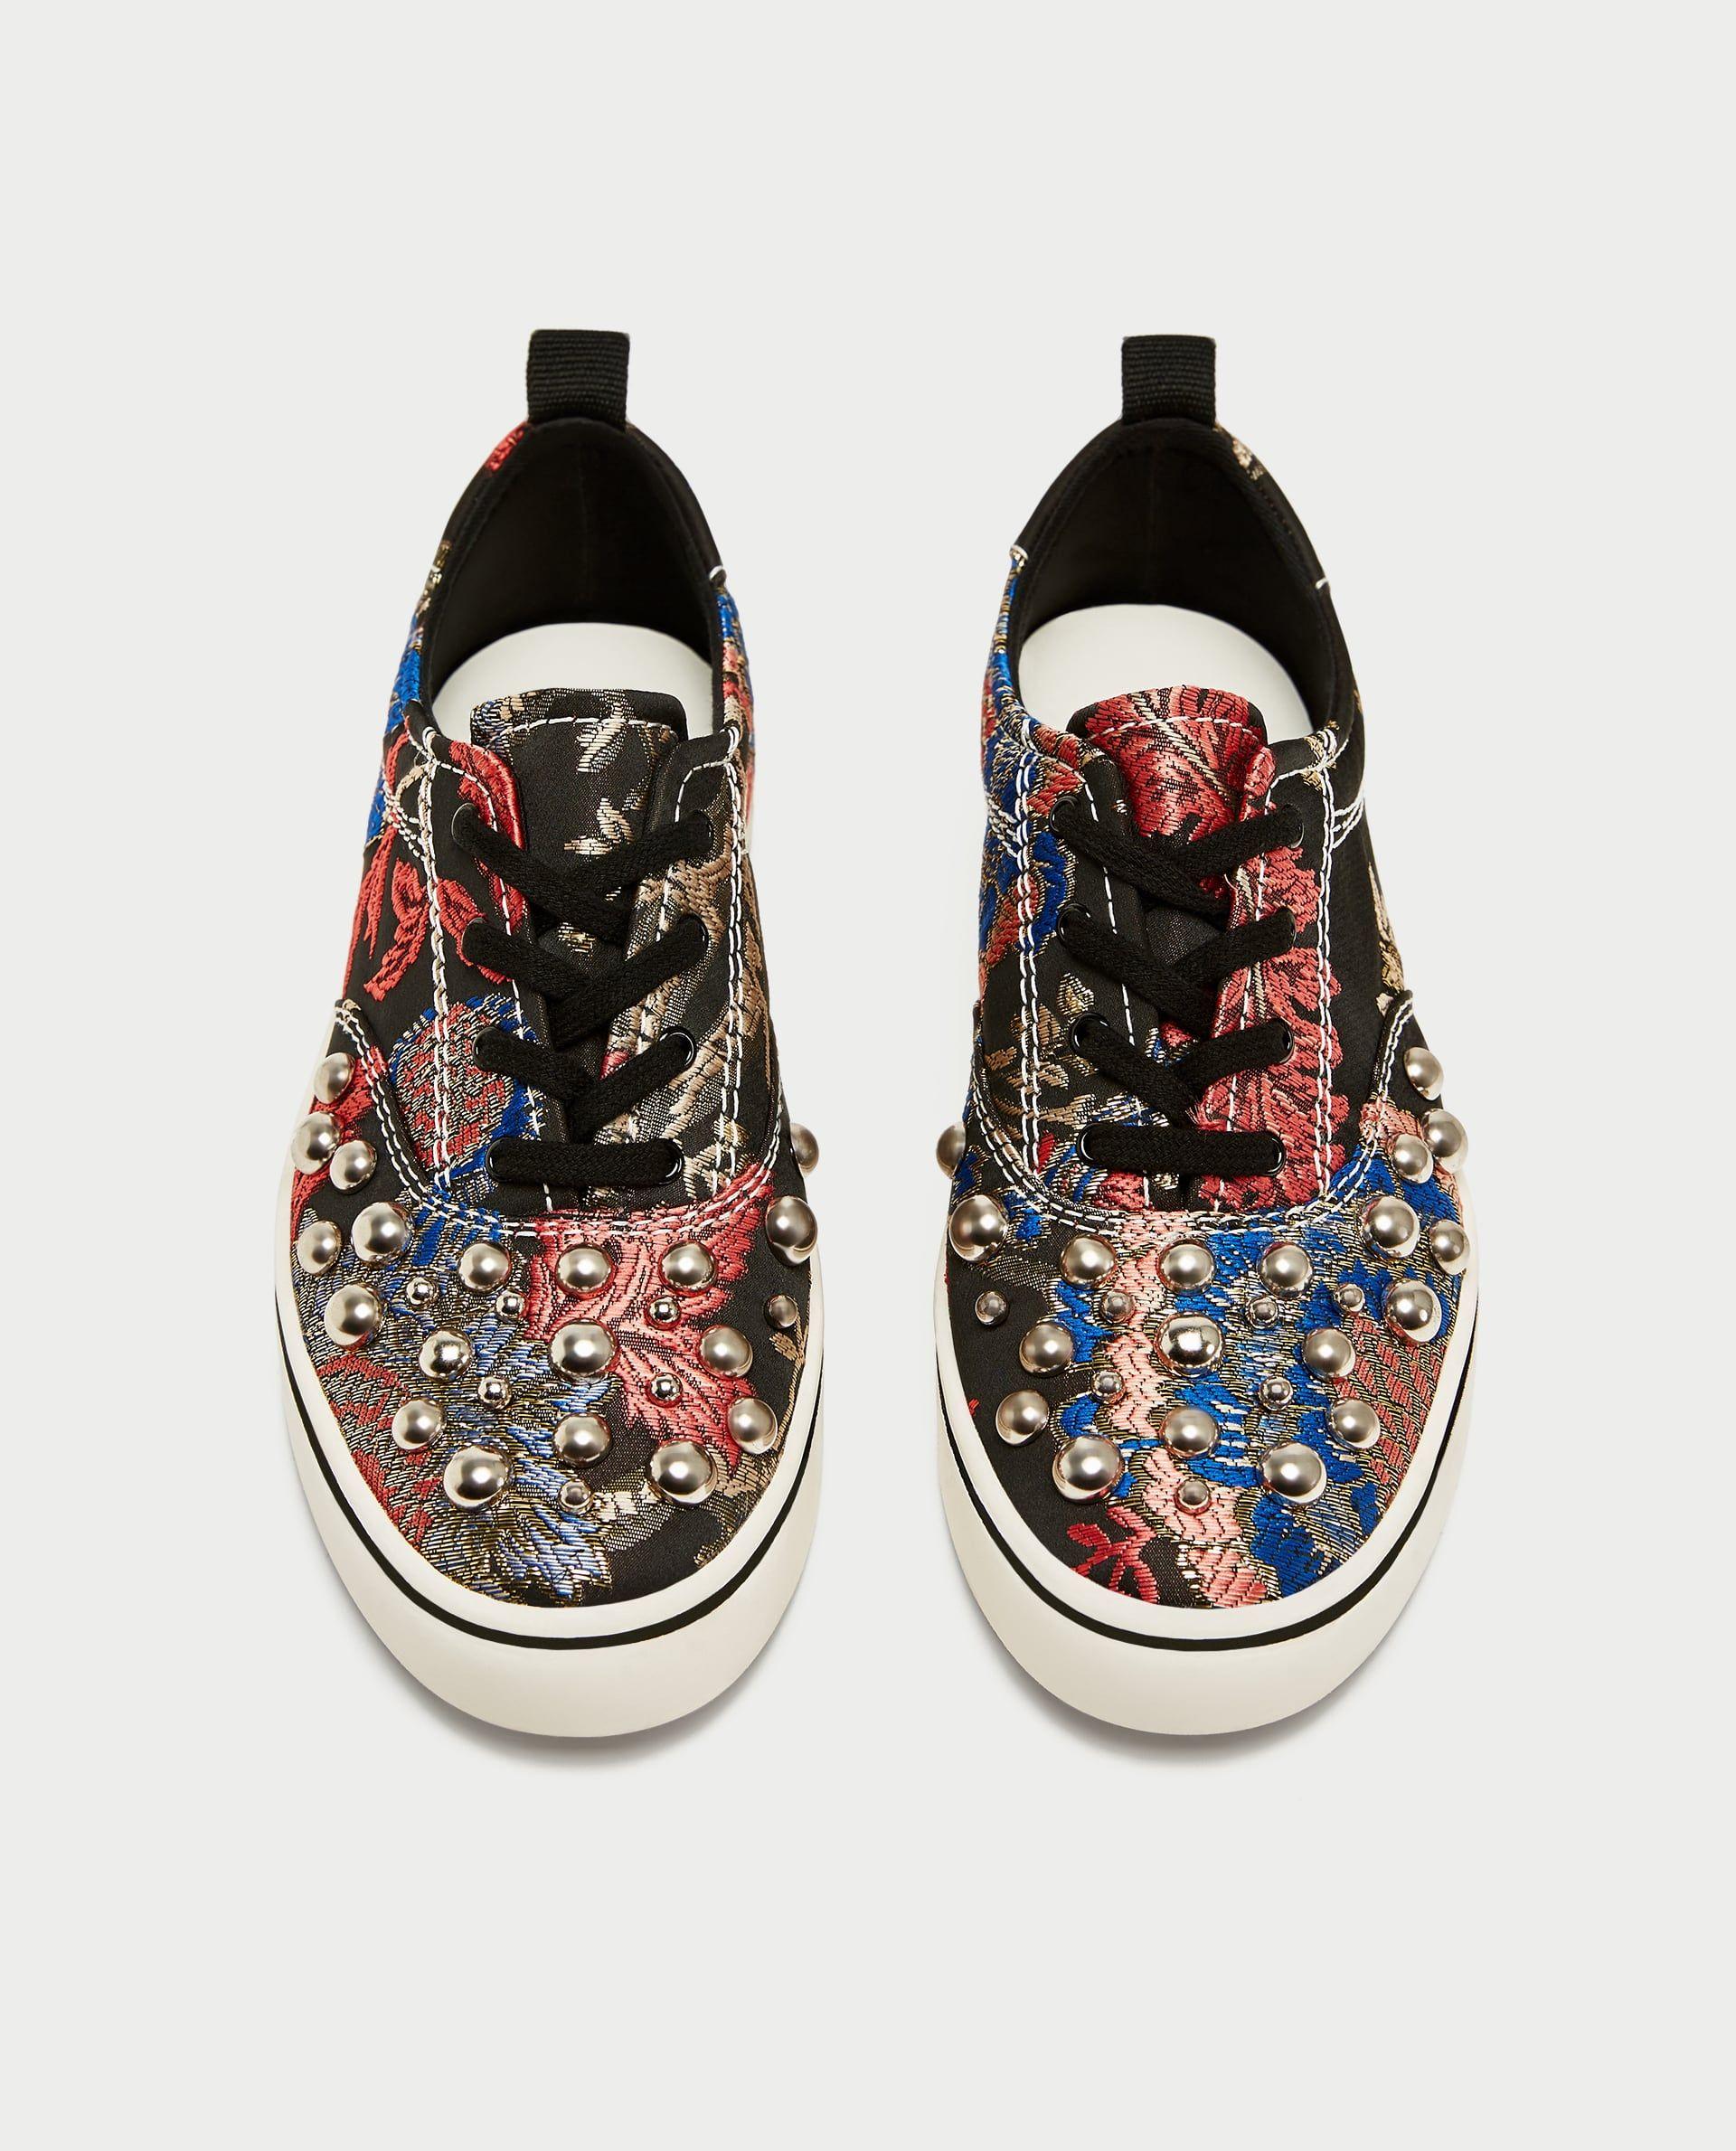 #PopbelaOOTD: Biar Keren, Yuk Pakai Sneakers Zaman Now Ini!